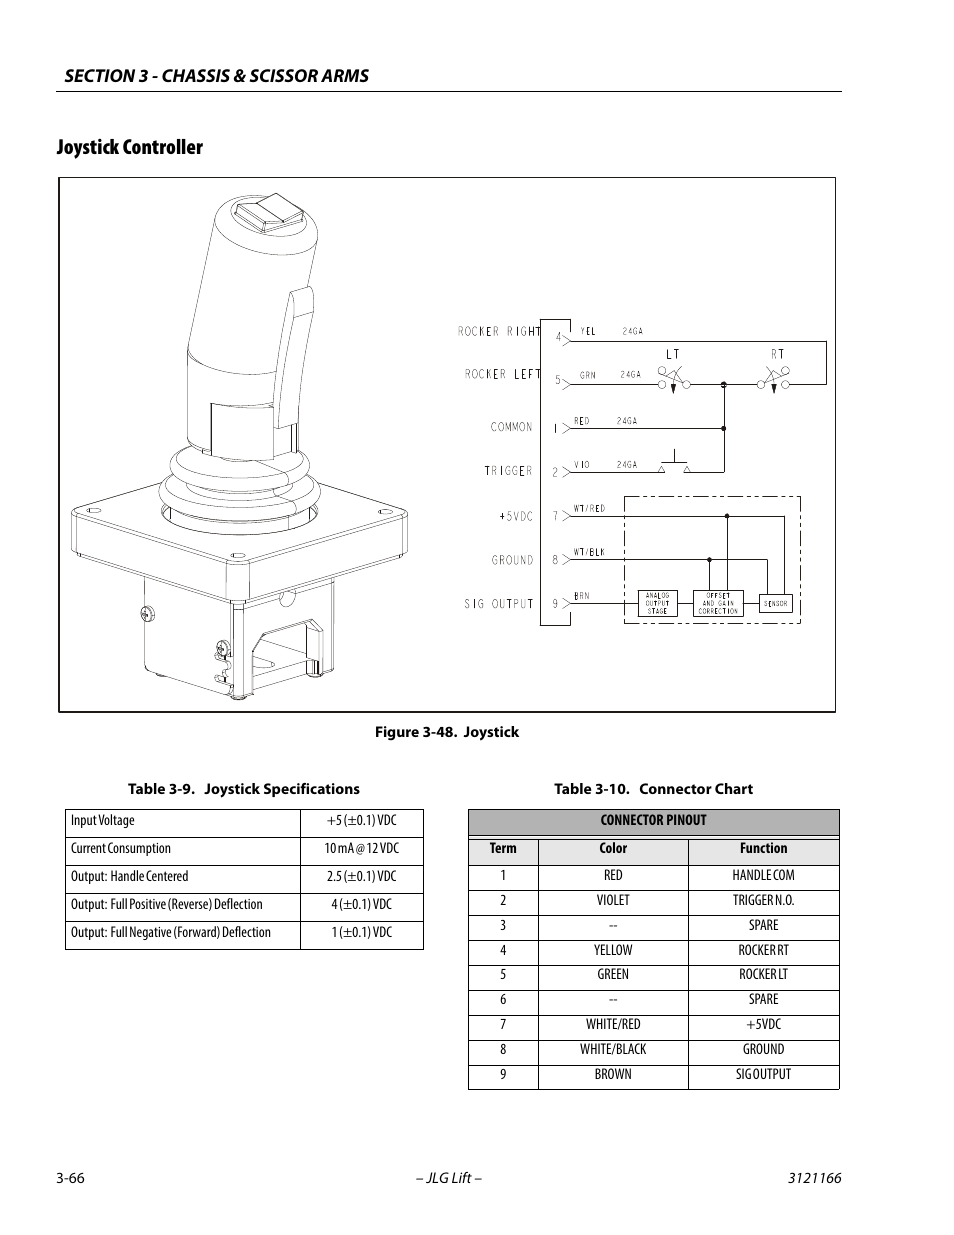 3246 Jlg Joystick Wiring Diagram Auto Electrical